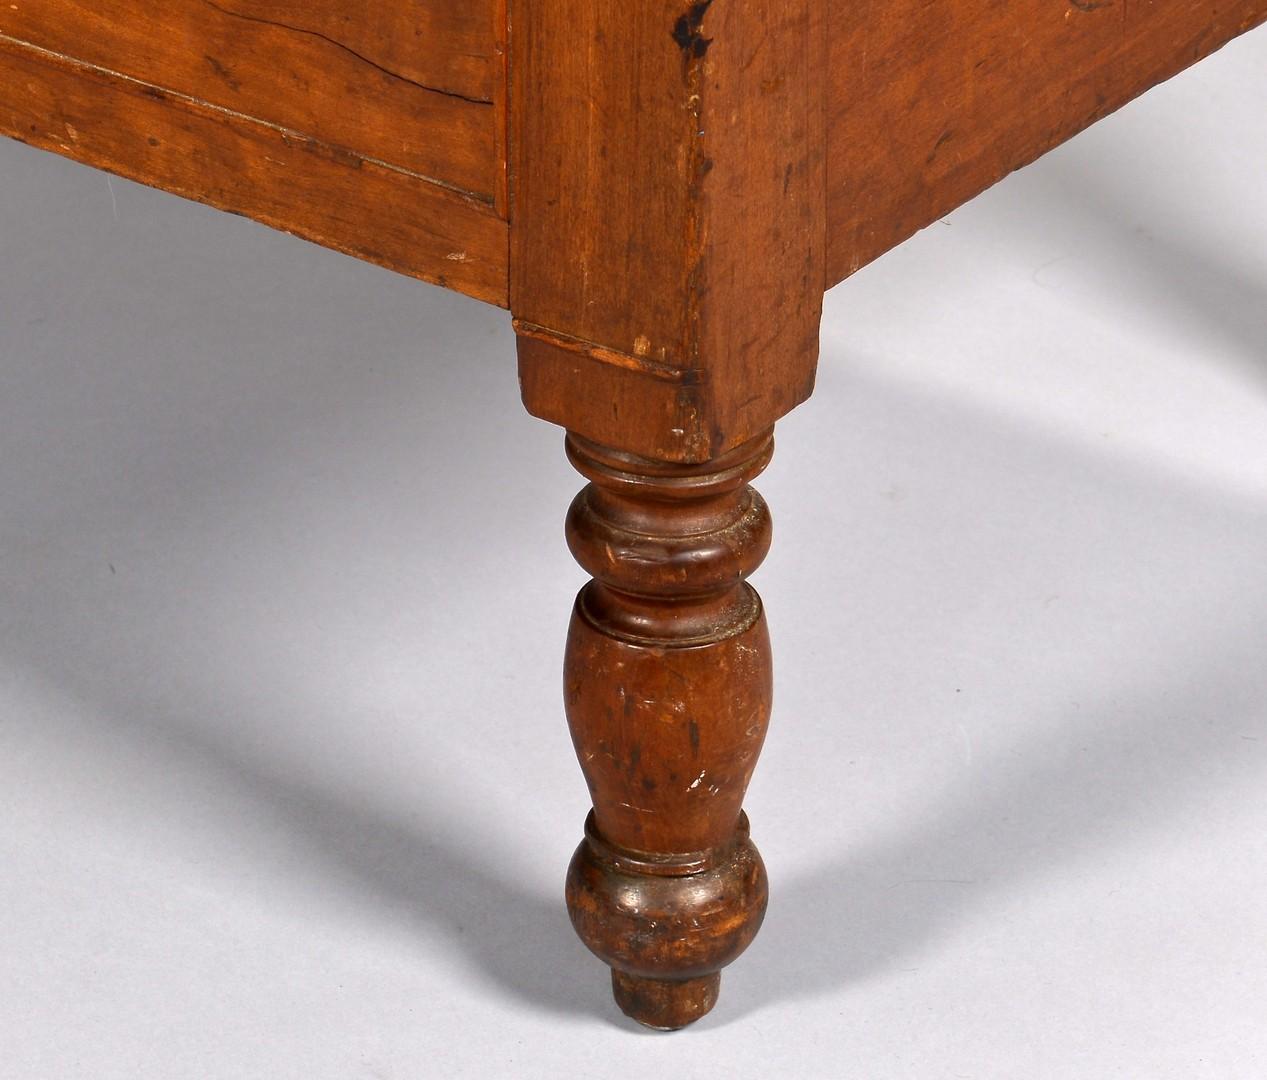 Lot 129: Kentucky Cherry Sugar Desk Bureau, exhibited